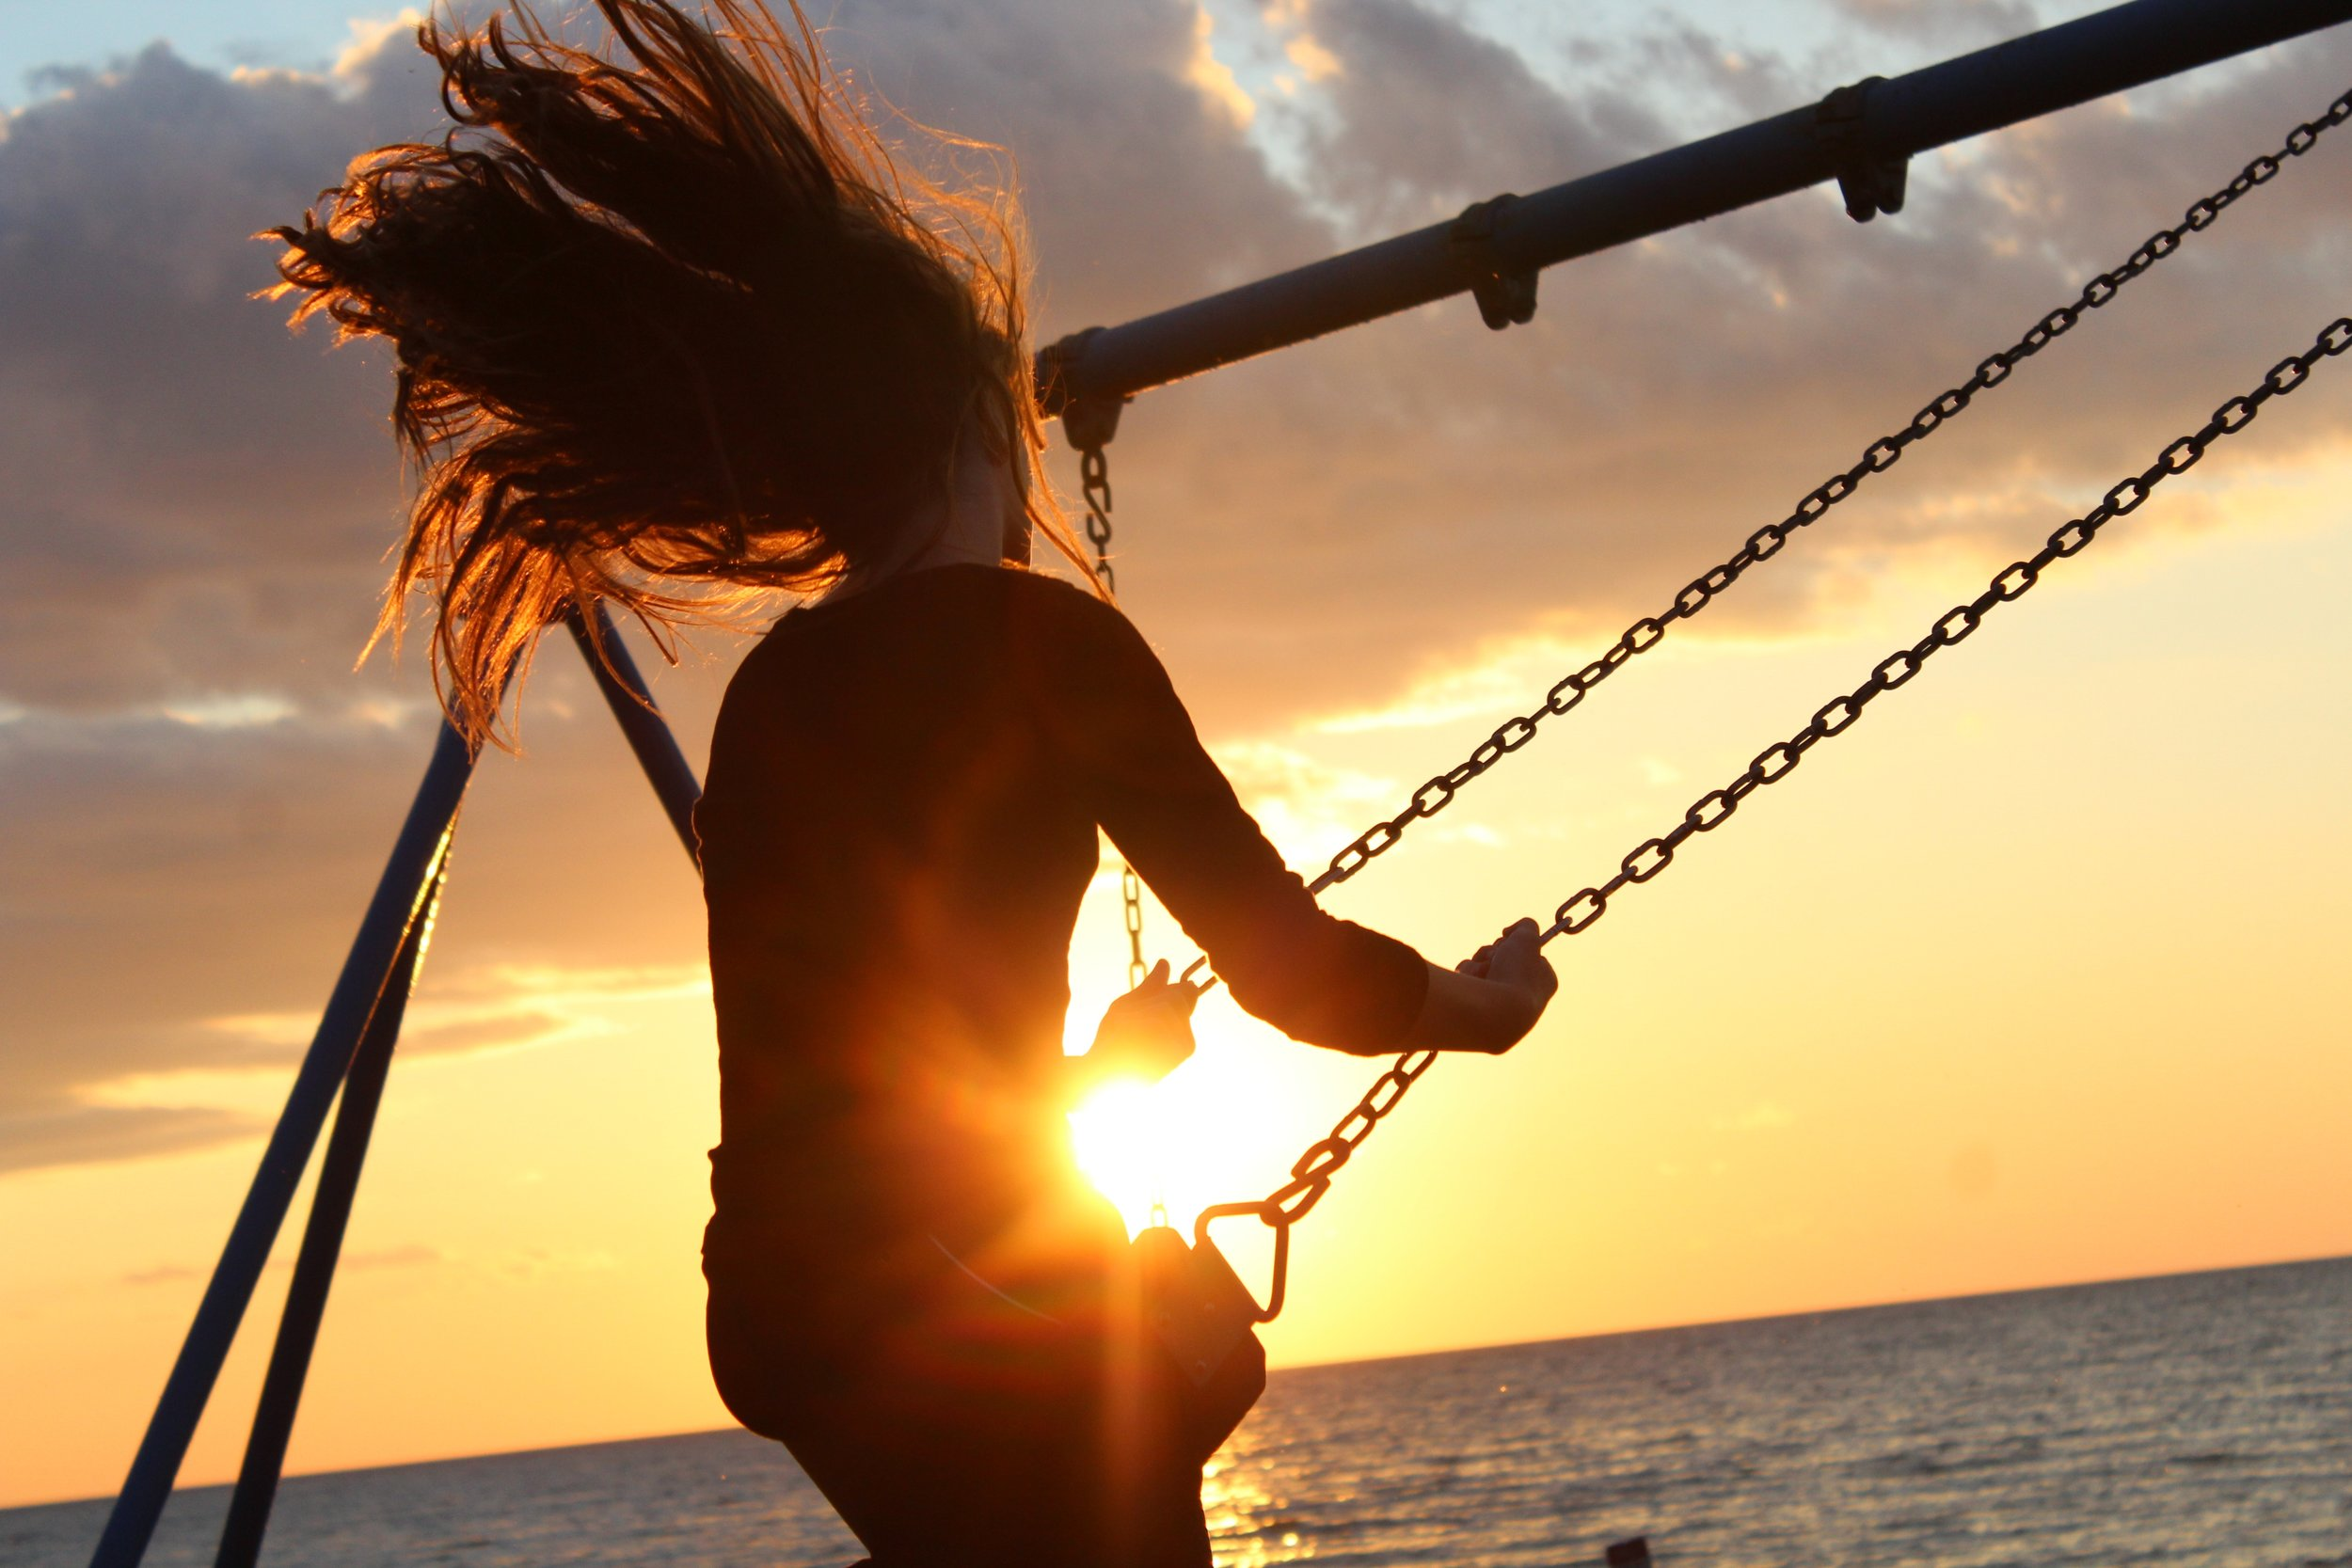 Happy swinging on the beach in West LA